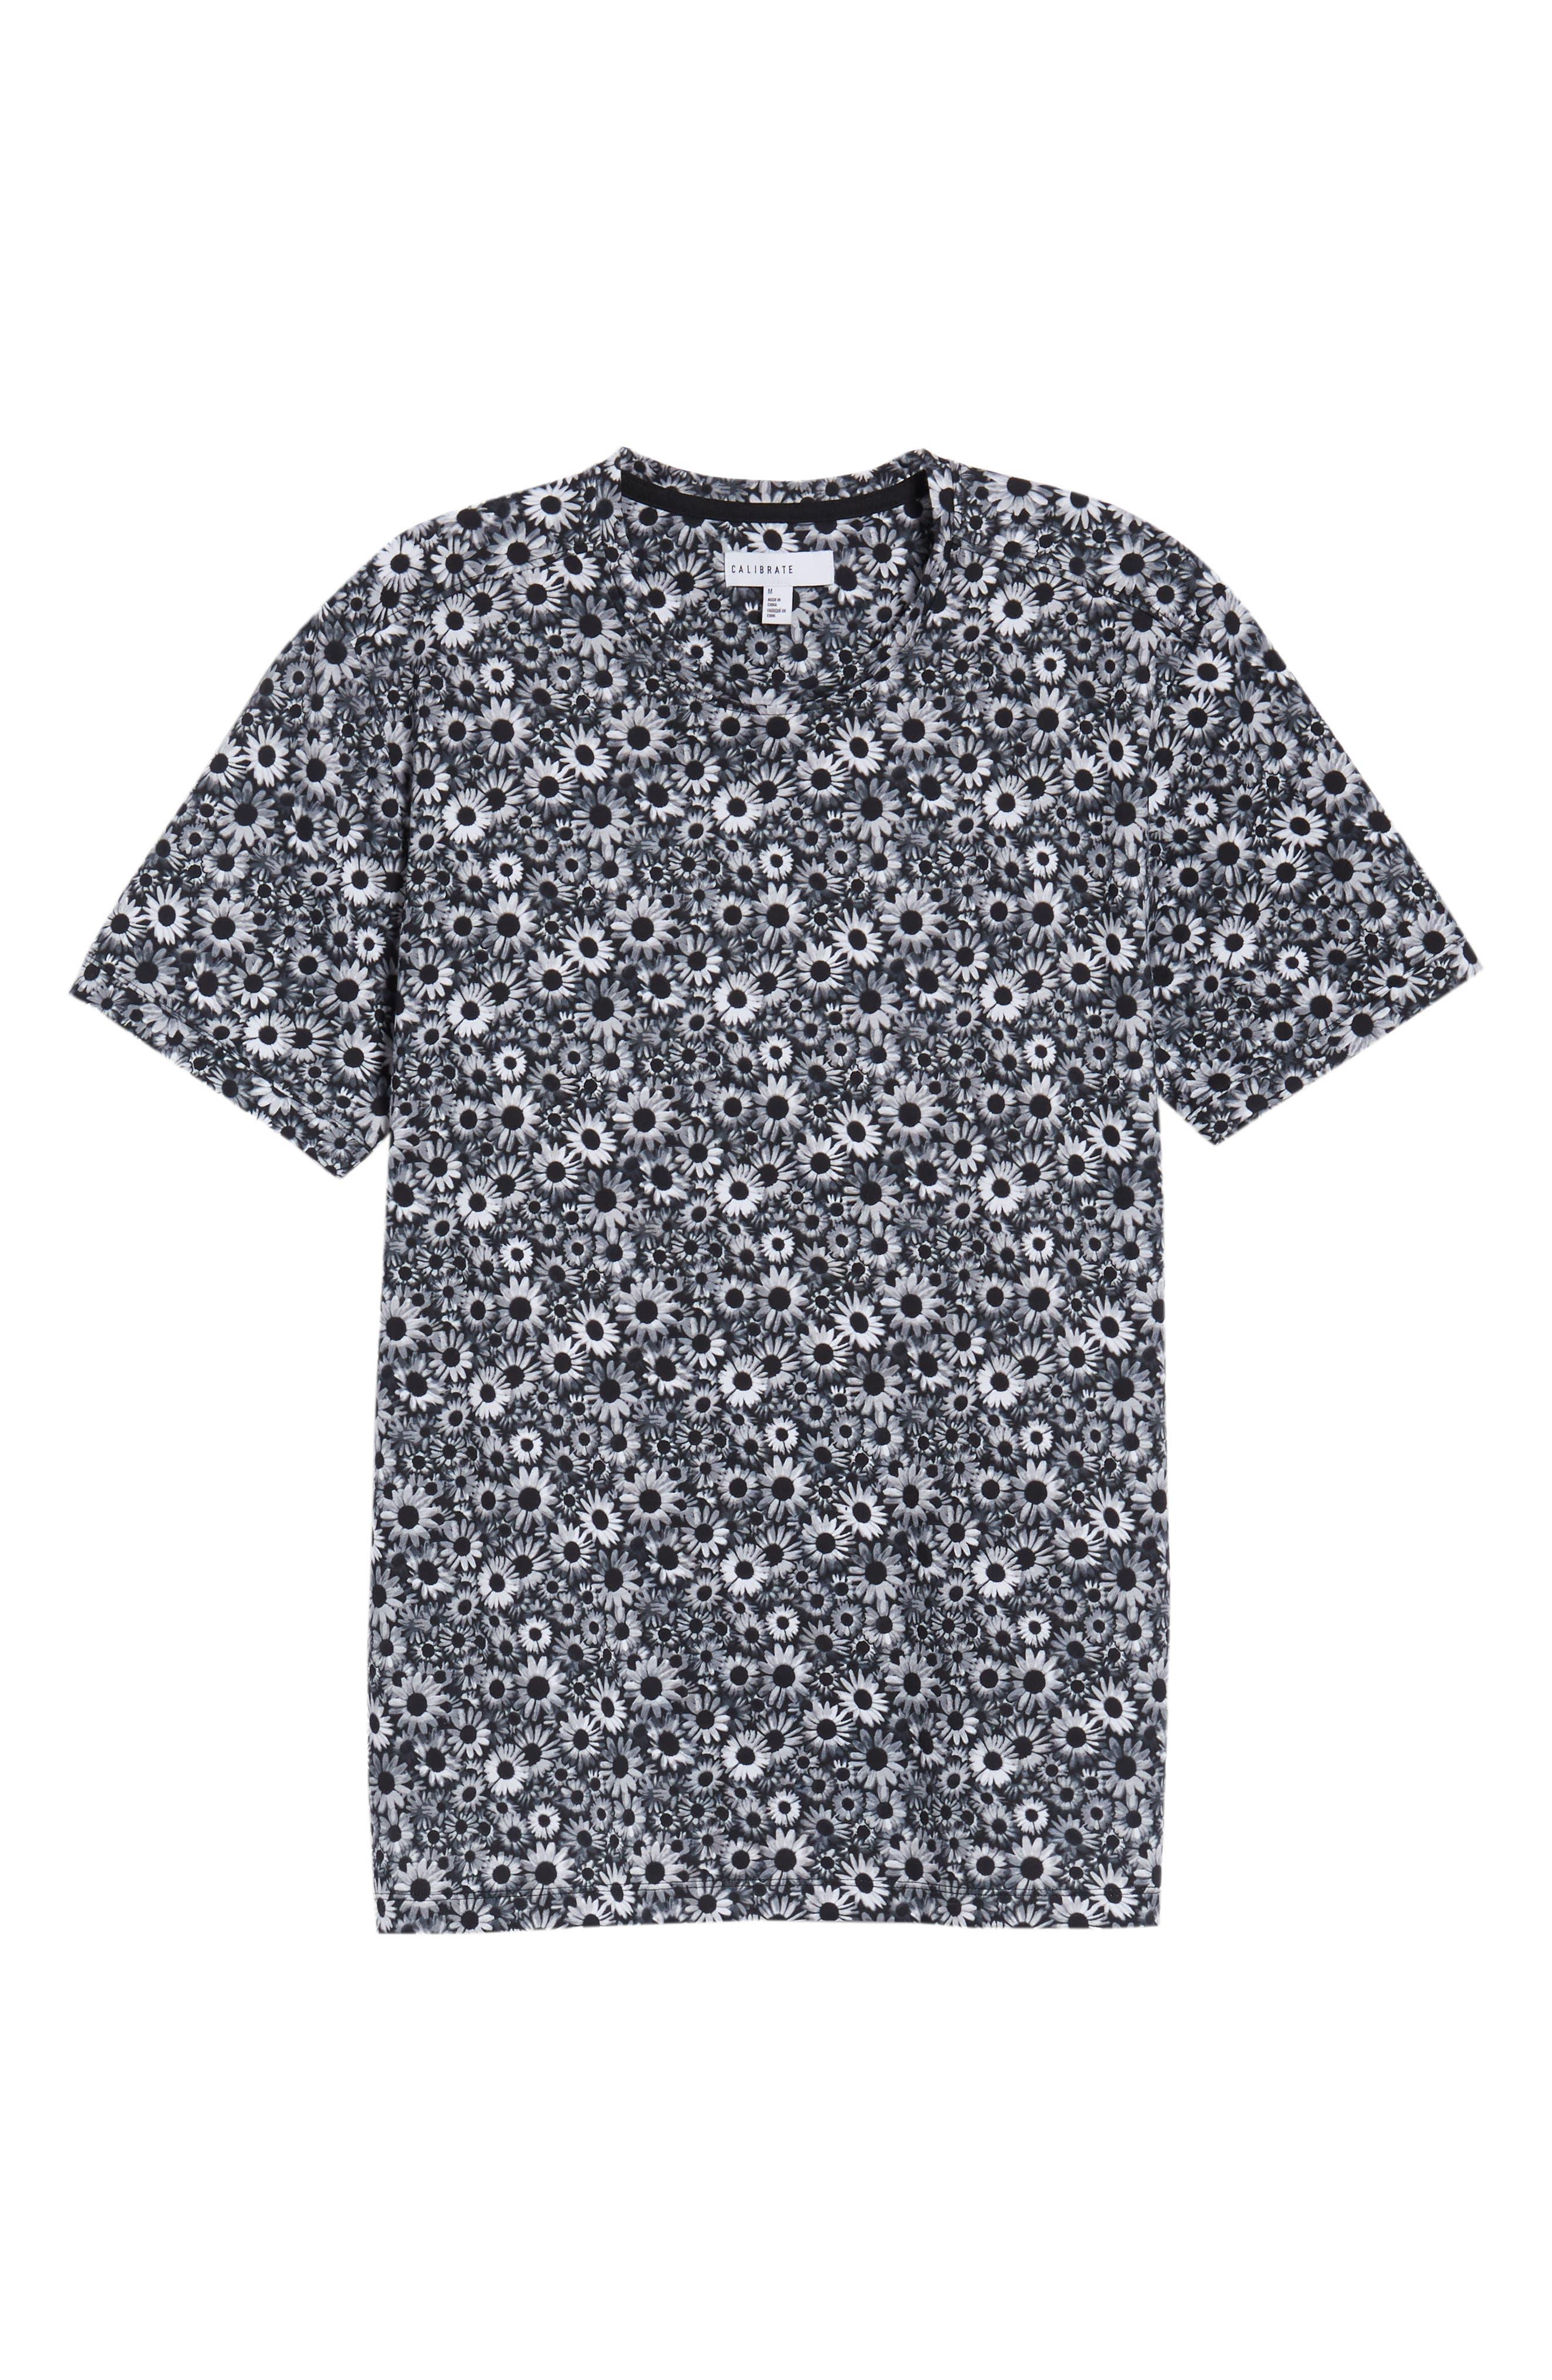 Print T-Shirt,                             Alternate thumbnail 6, color,                             BLACK WHITE DAISY FLORAL